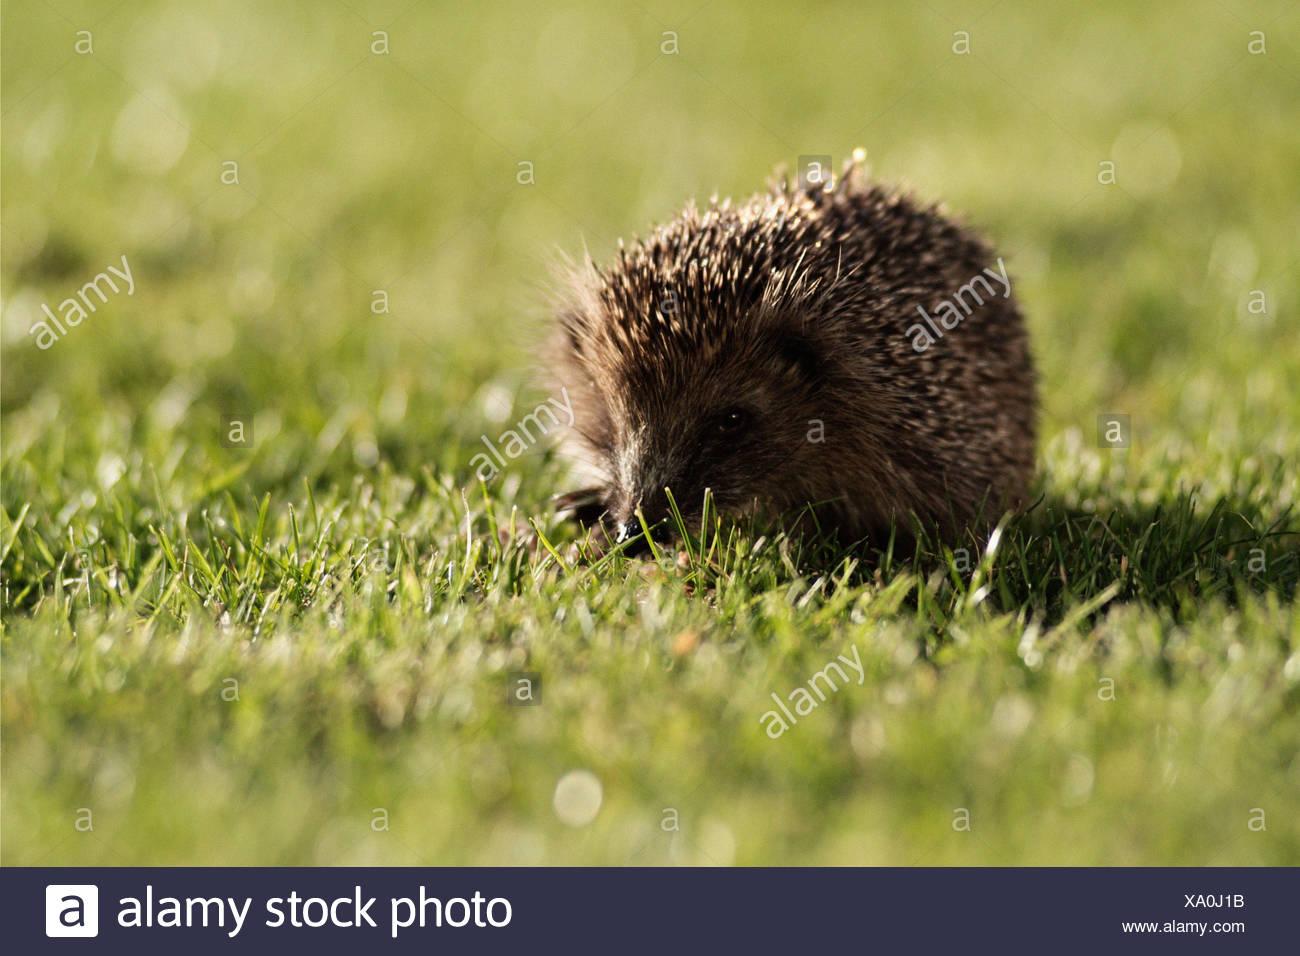 Hedgehog in a field - Stock Image